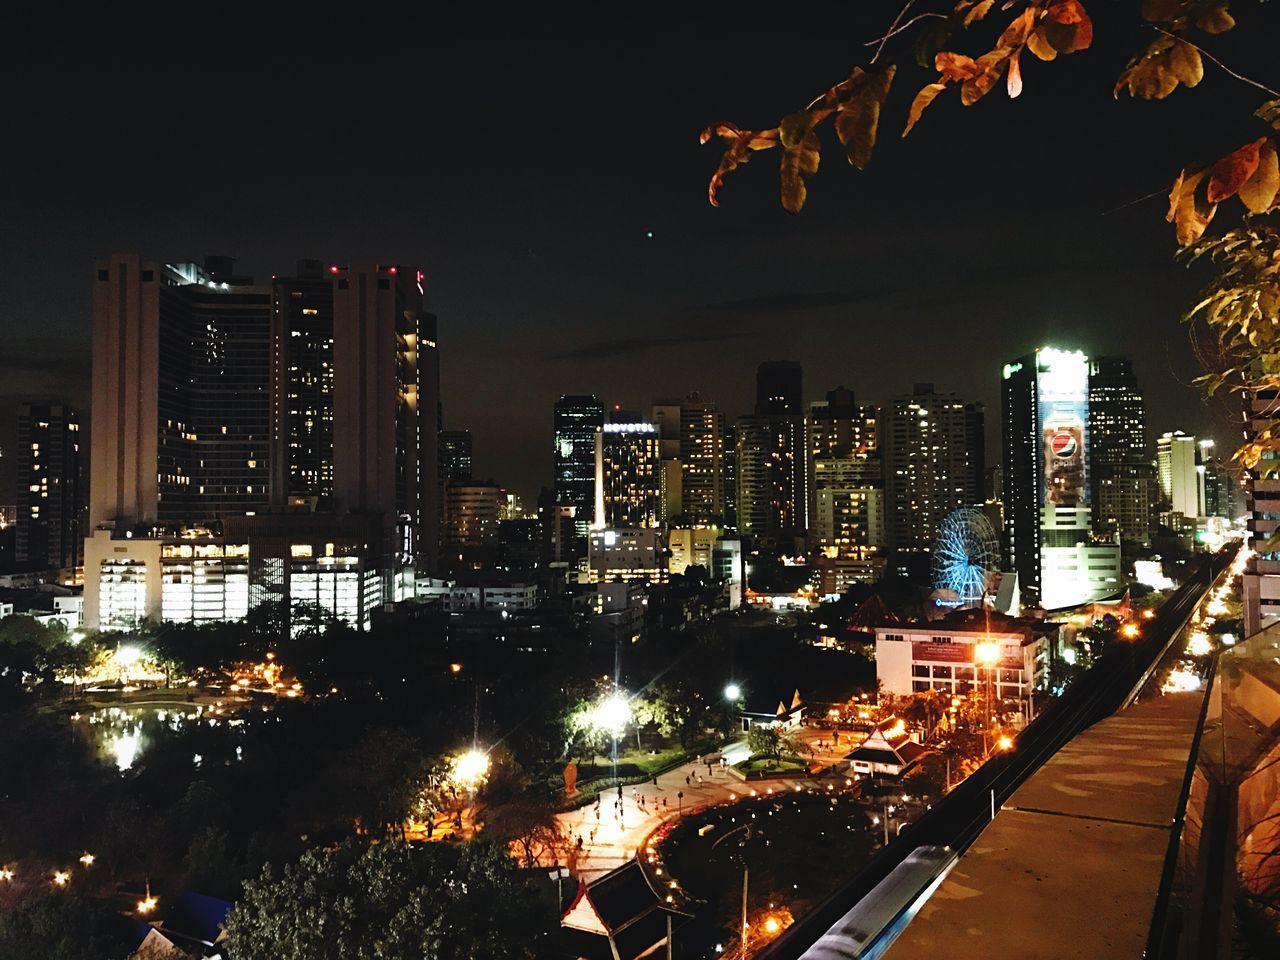 Night Lights Night View Nightshot Night Sky Night City Illuminated Rooftop High Angle View Bkk Thailand Cityscape